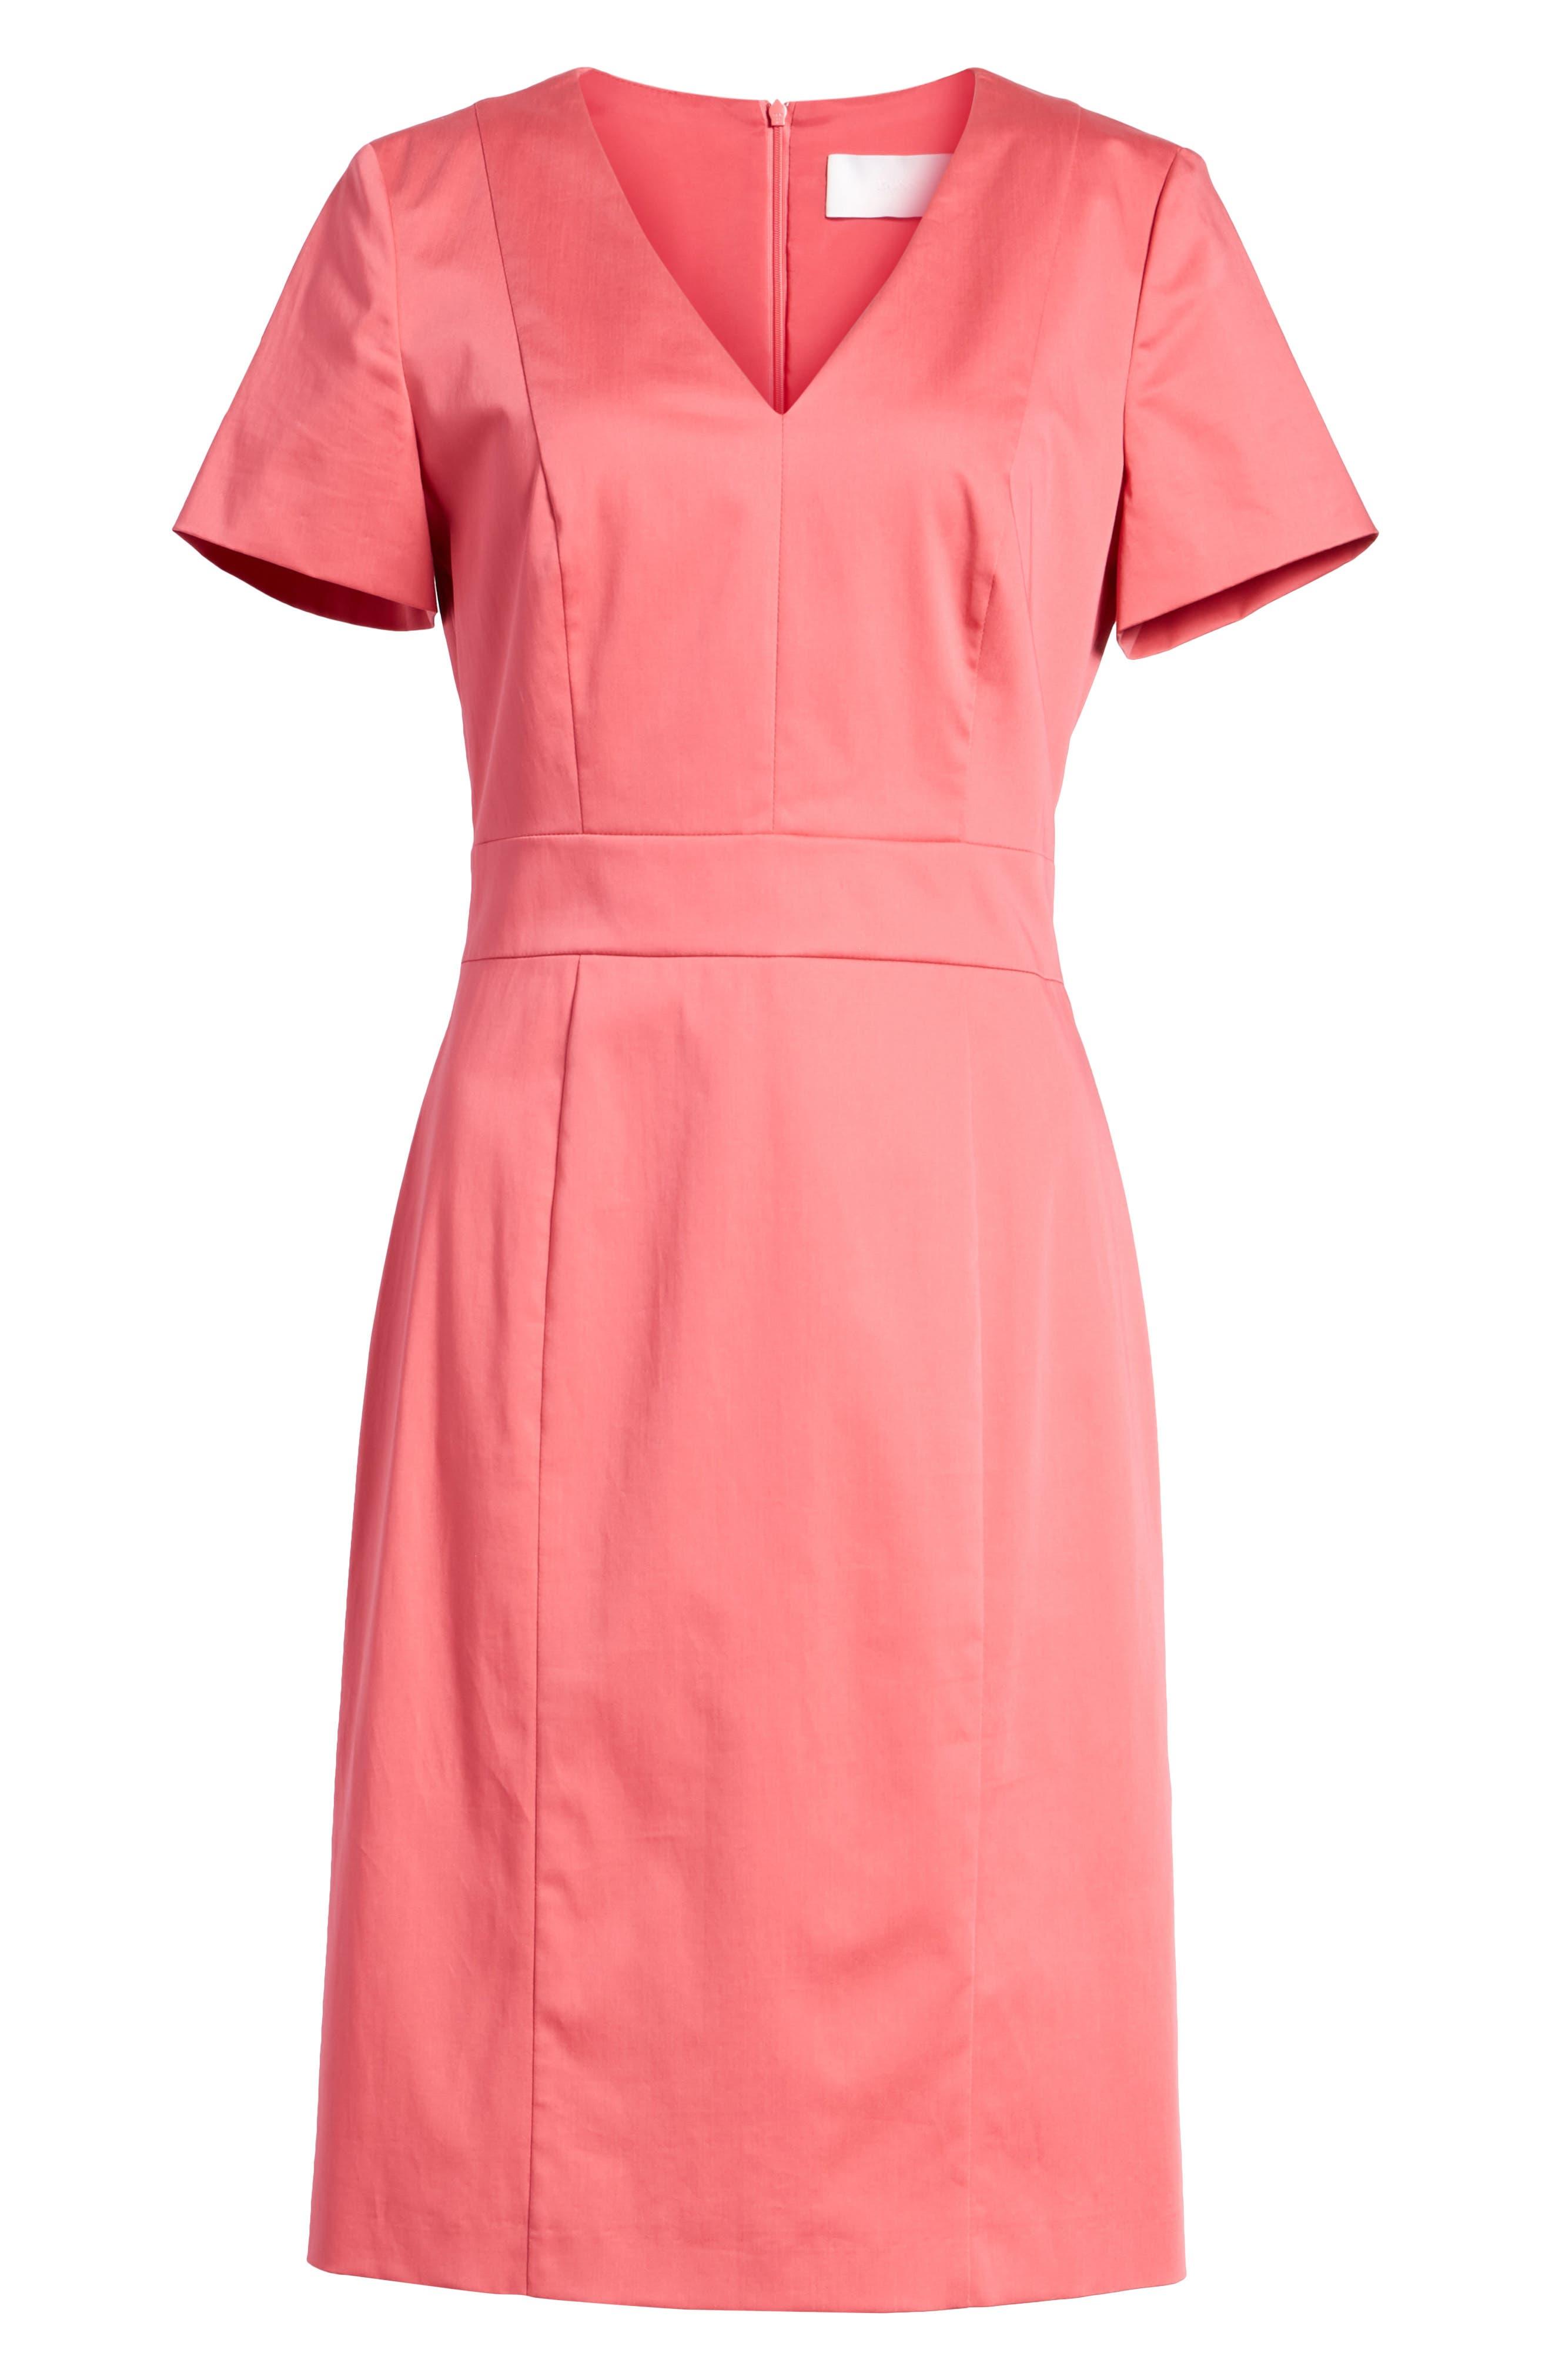 Dasali V-Neck Sheath Dress,                             Alternate thumbnail 7, color,                             Lychee Pink